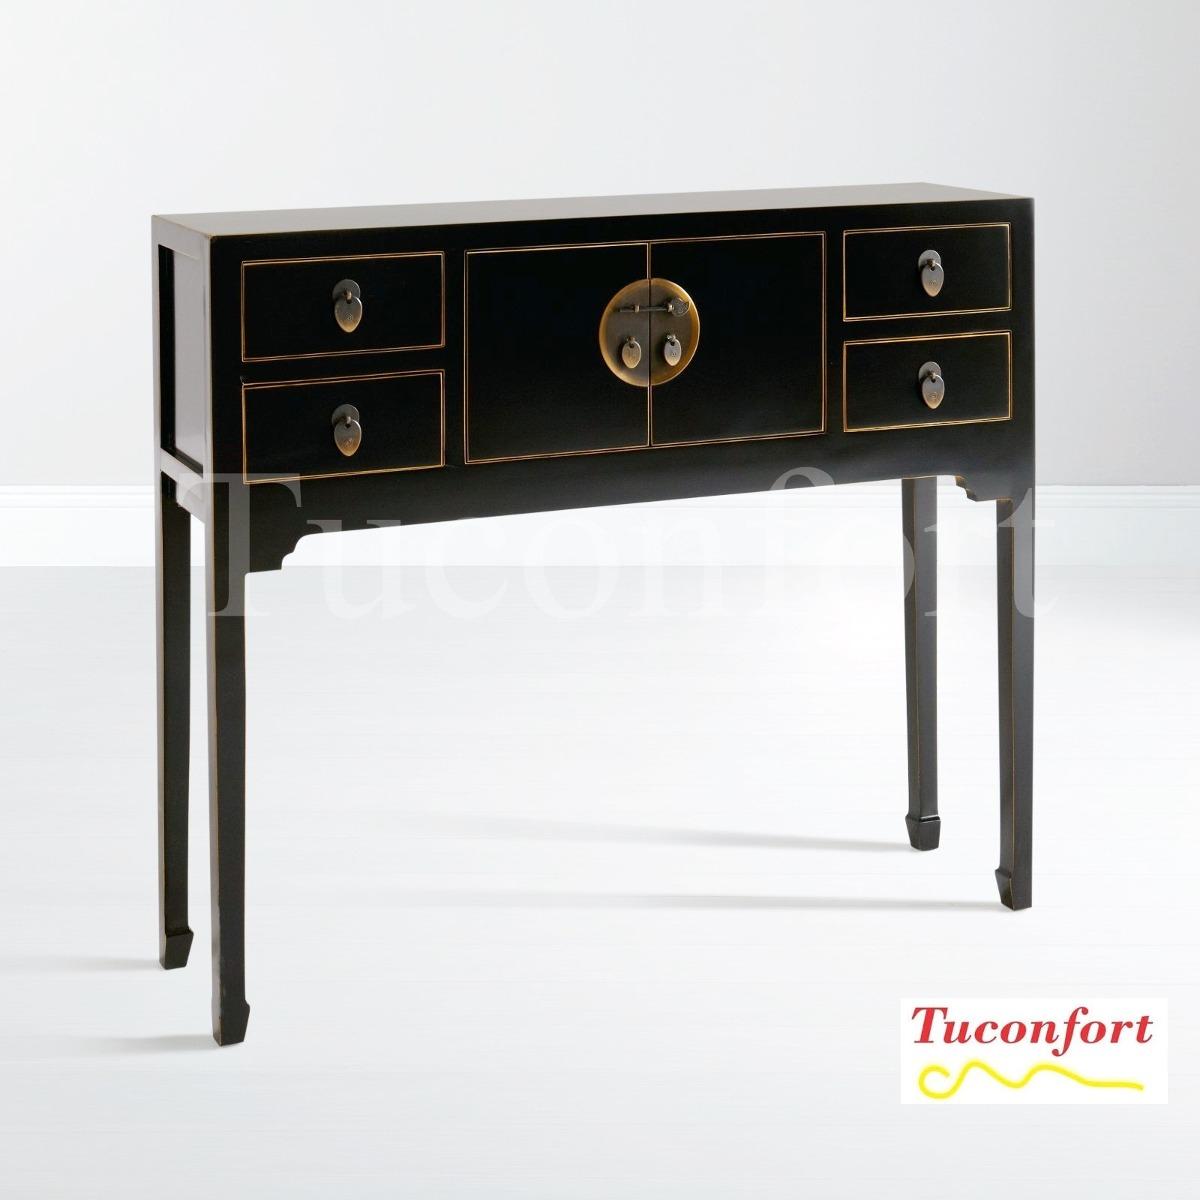 Armario Aparador Consola Living Muebles Envio Gratis - $ 11.990,00 ...